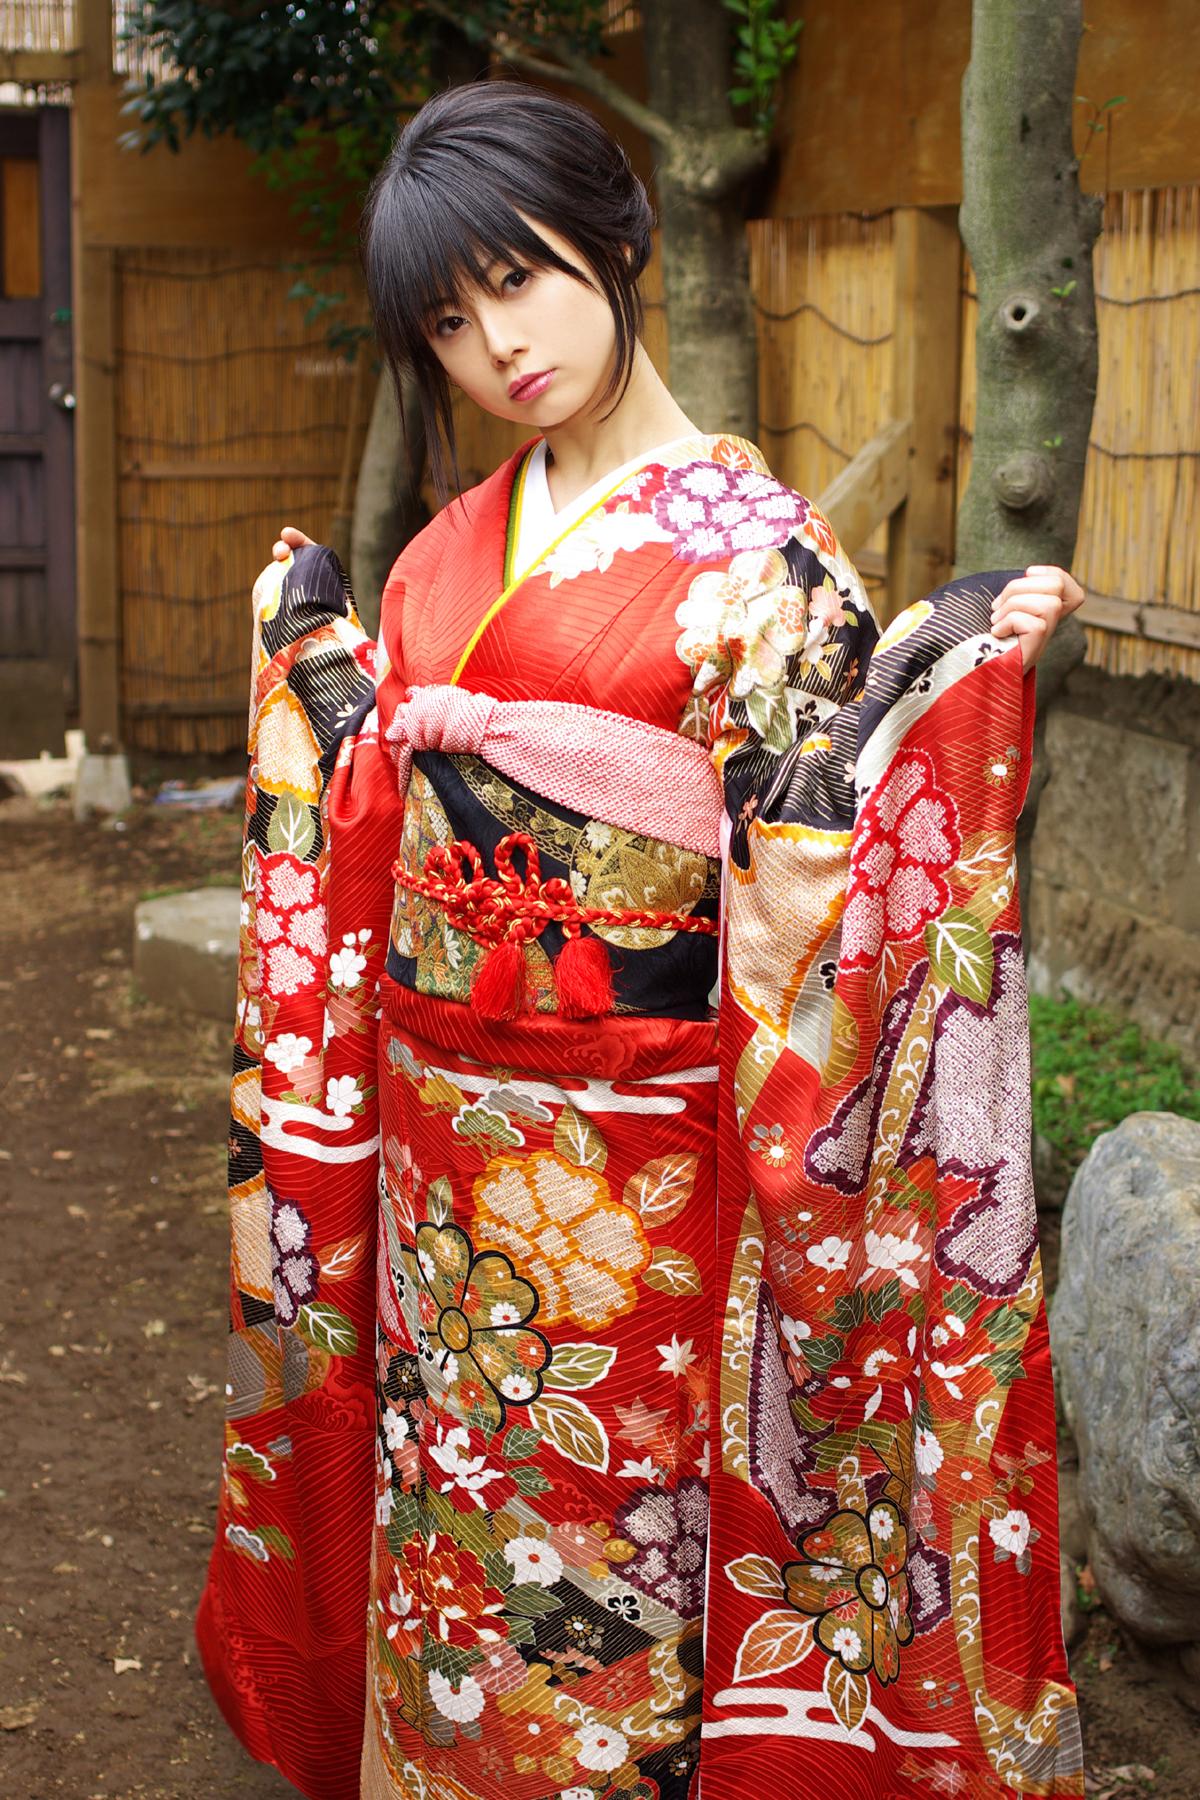 76 Kimono Wallpaper On Wallpapersafari